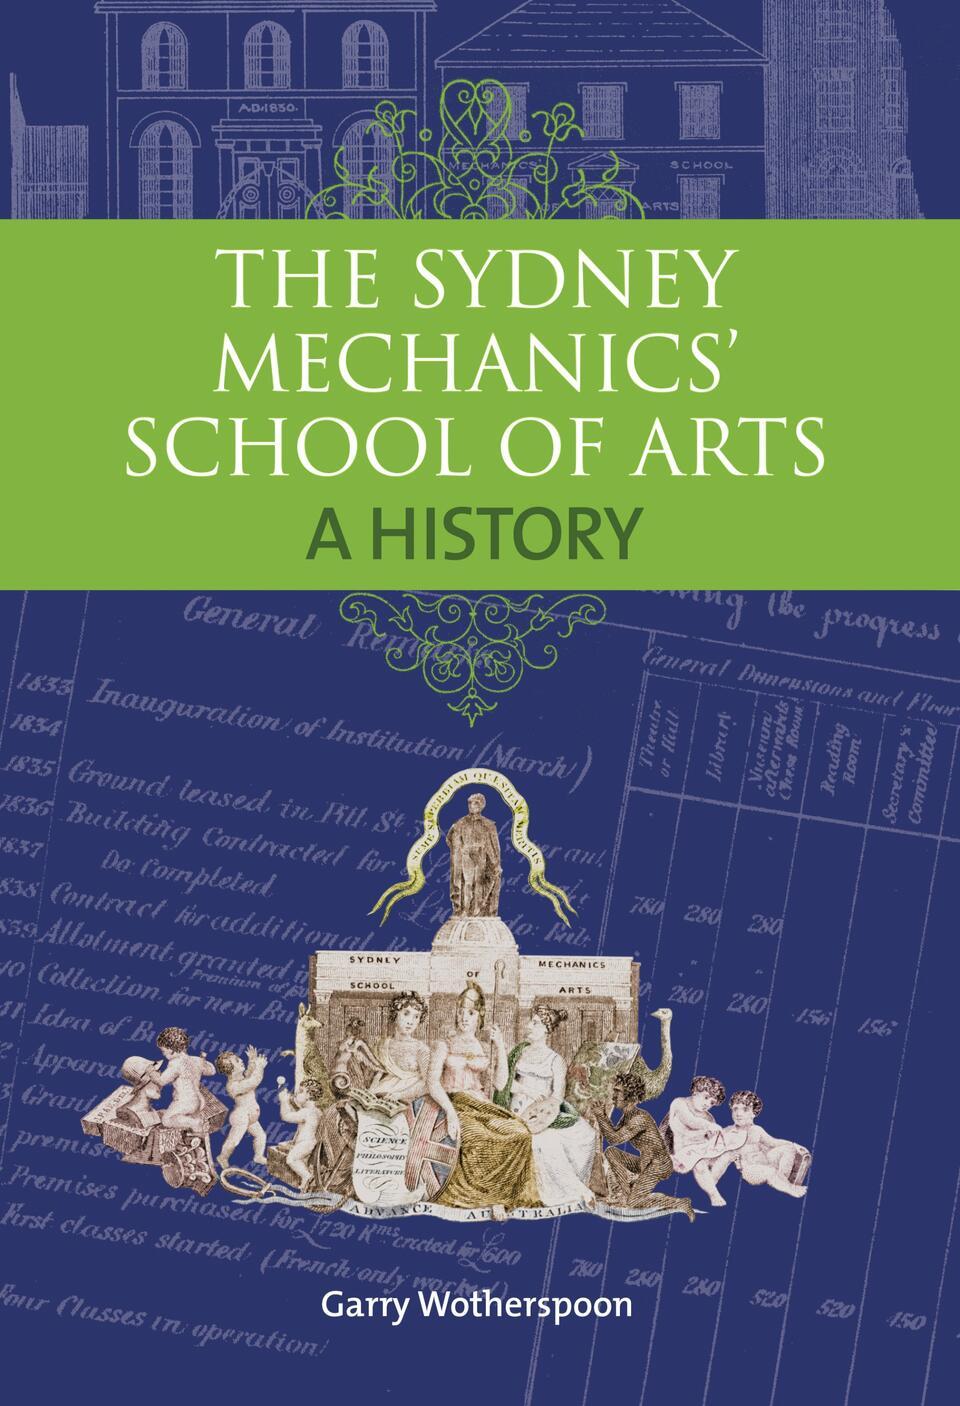 Sydney Mechanic School of Arts A History